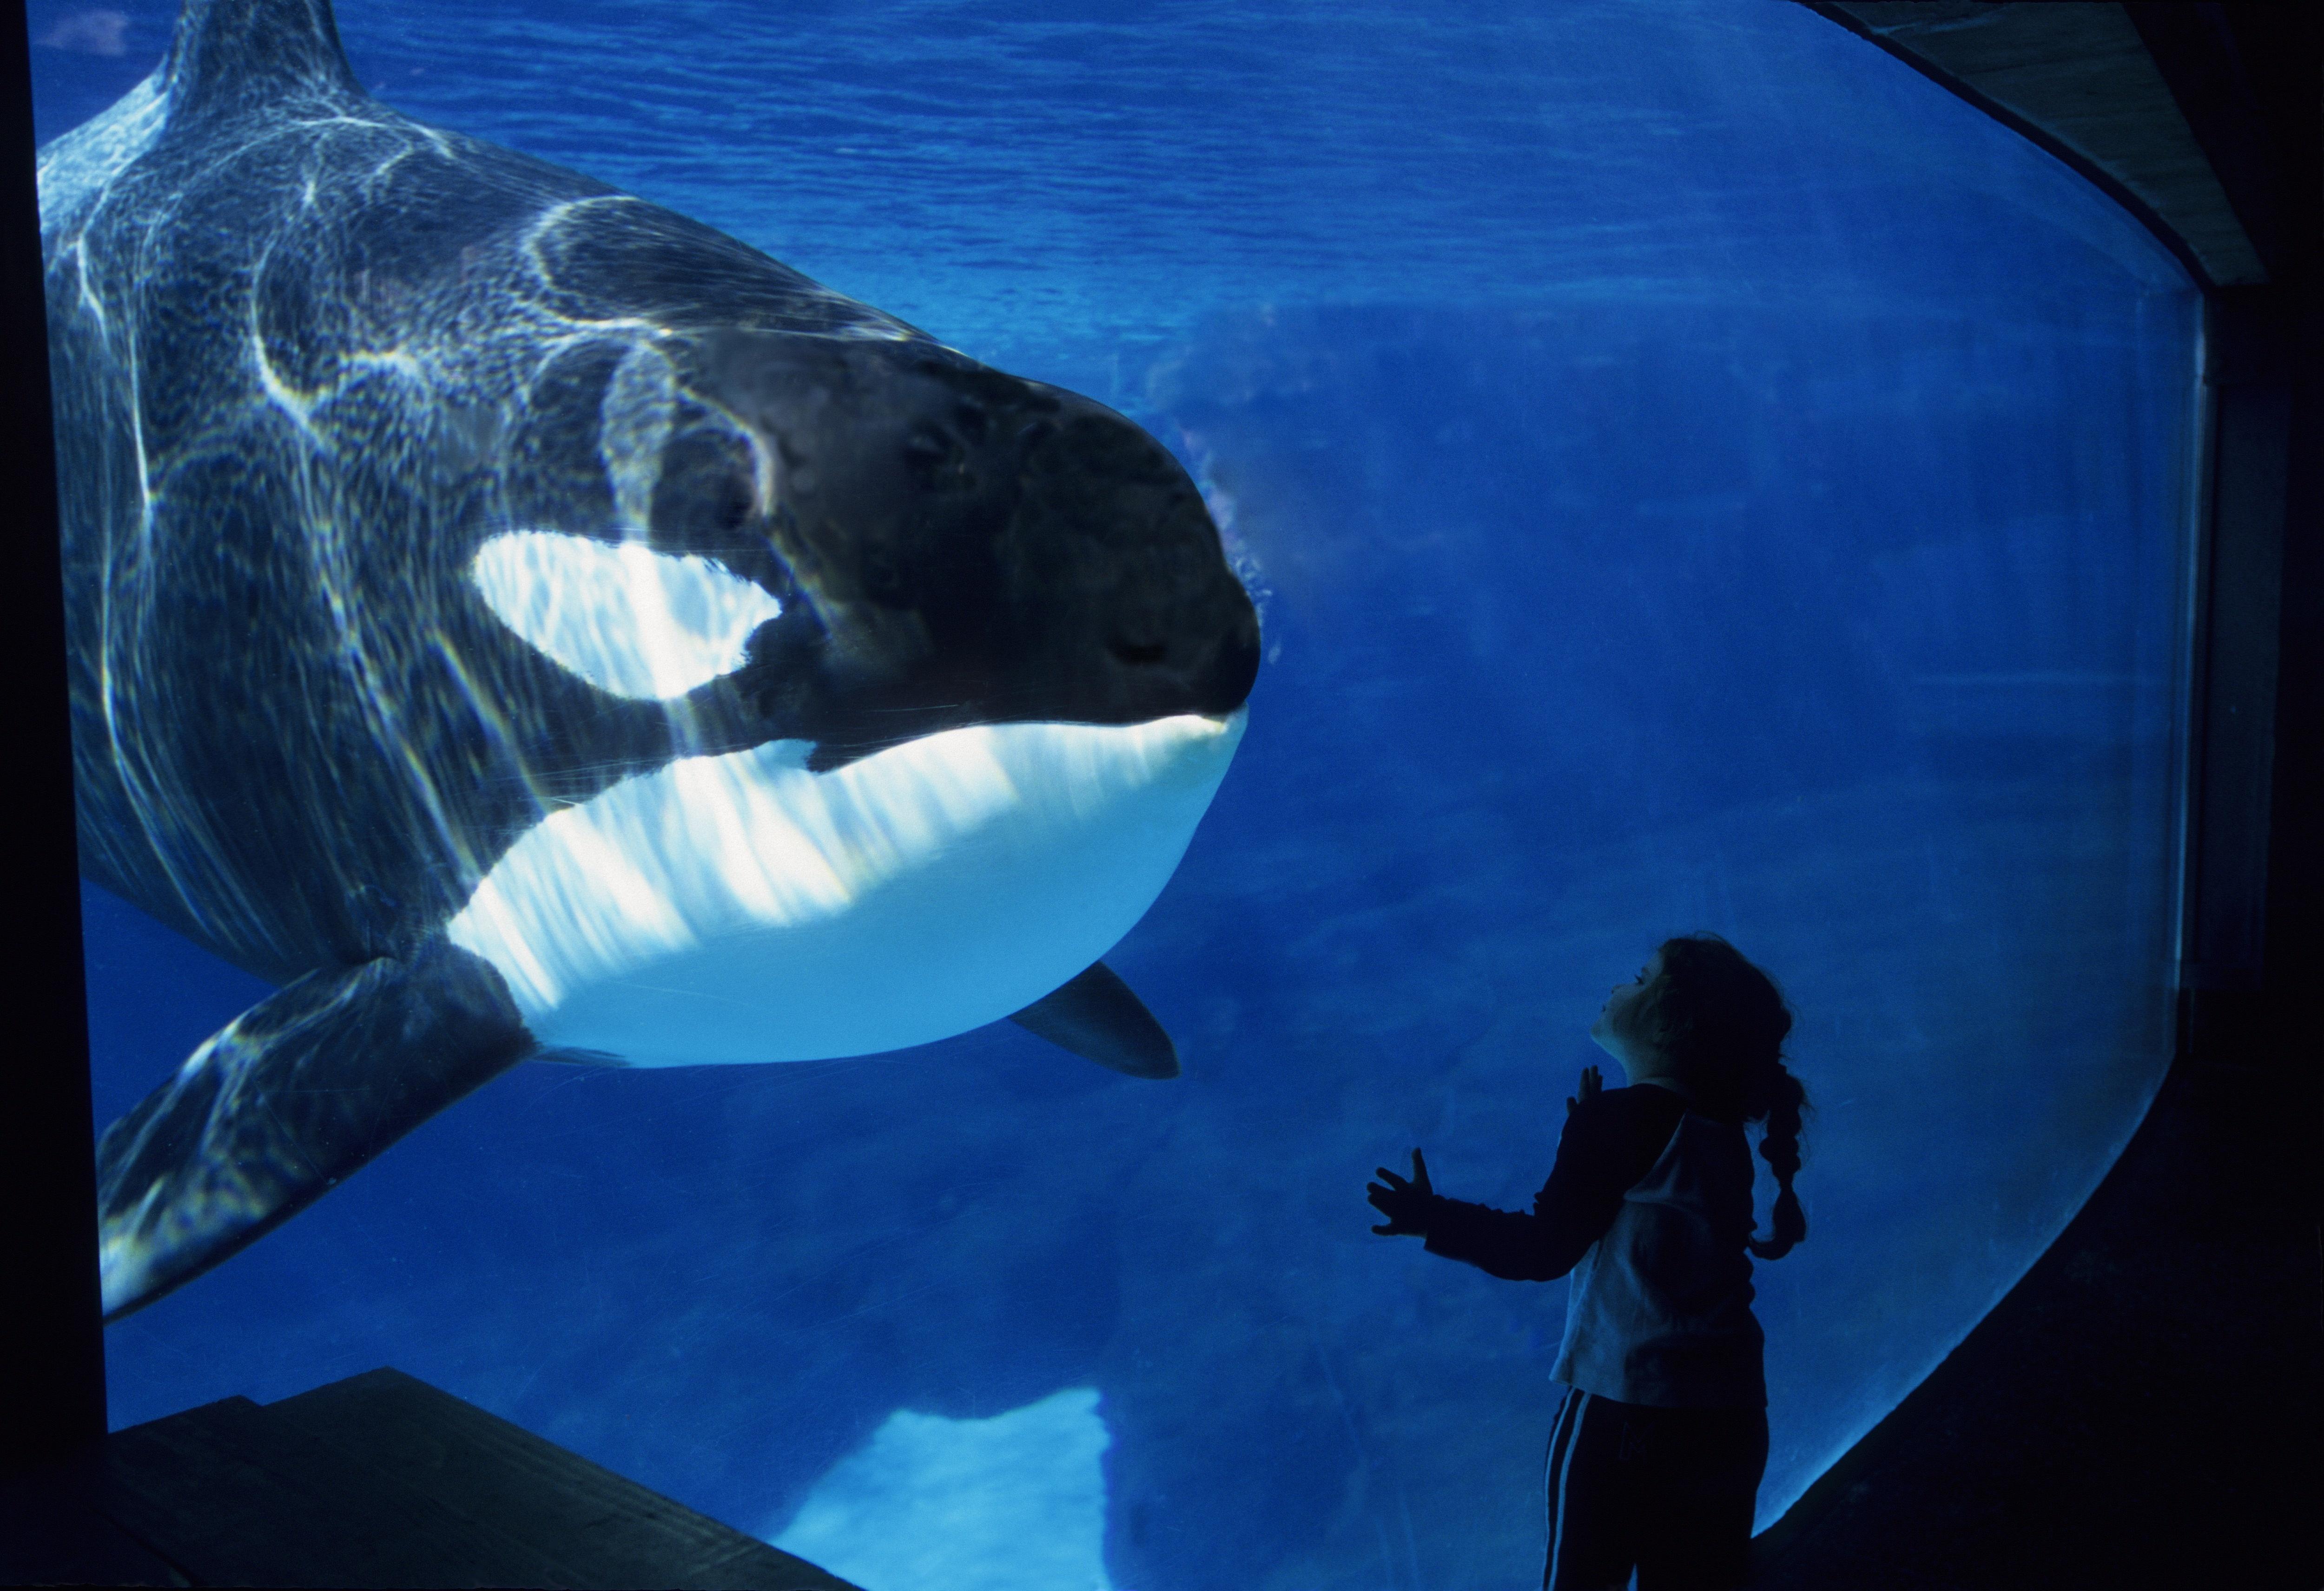 USA, California, San Diego, Sea World, Killer Whale (orca) Underwater, Girl, 2006.